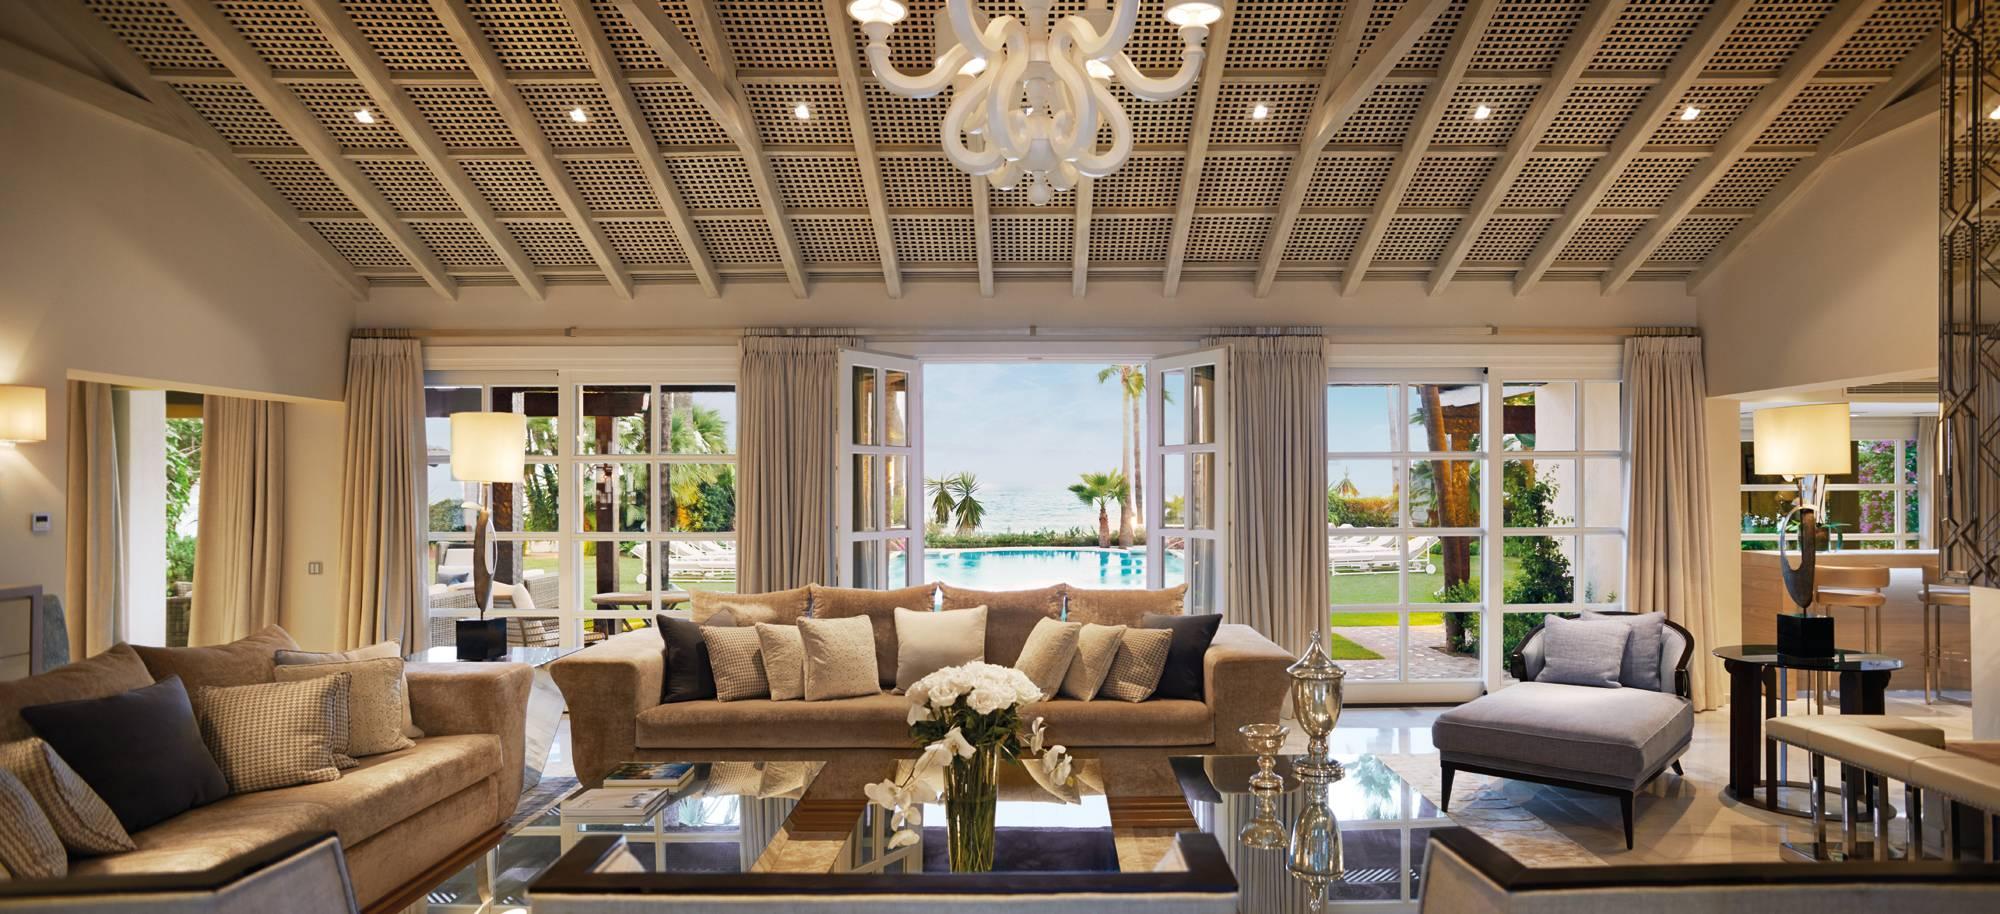 Marbella Club Villa del Mar - Central Livingroom Pool Views